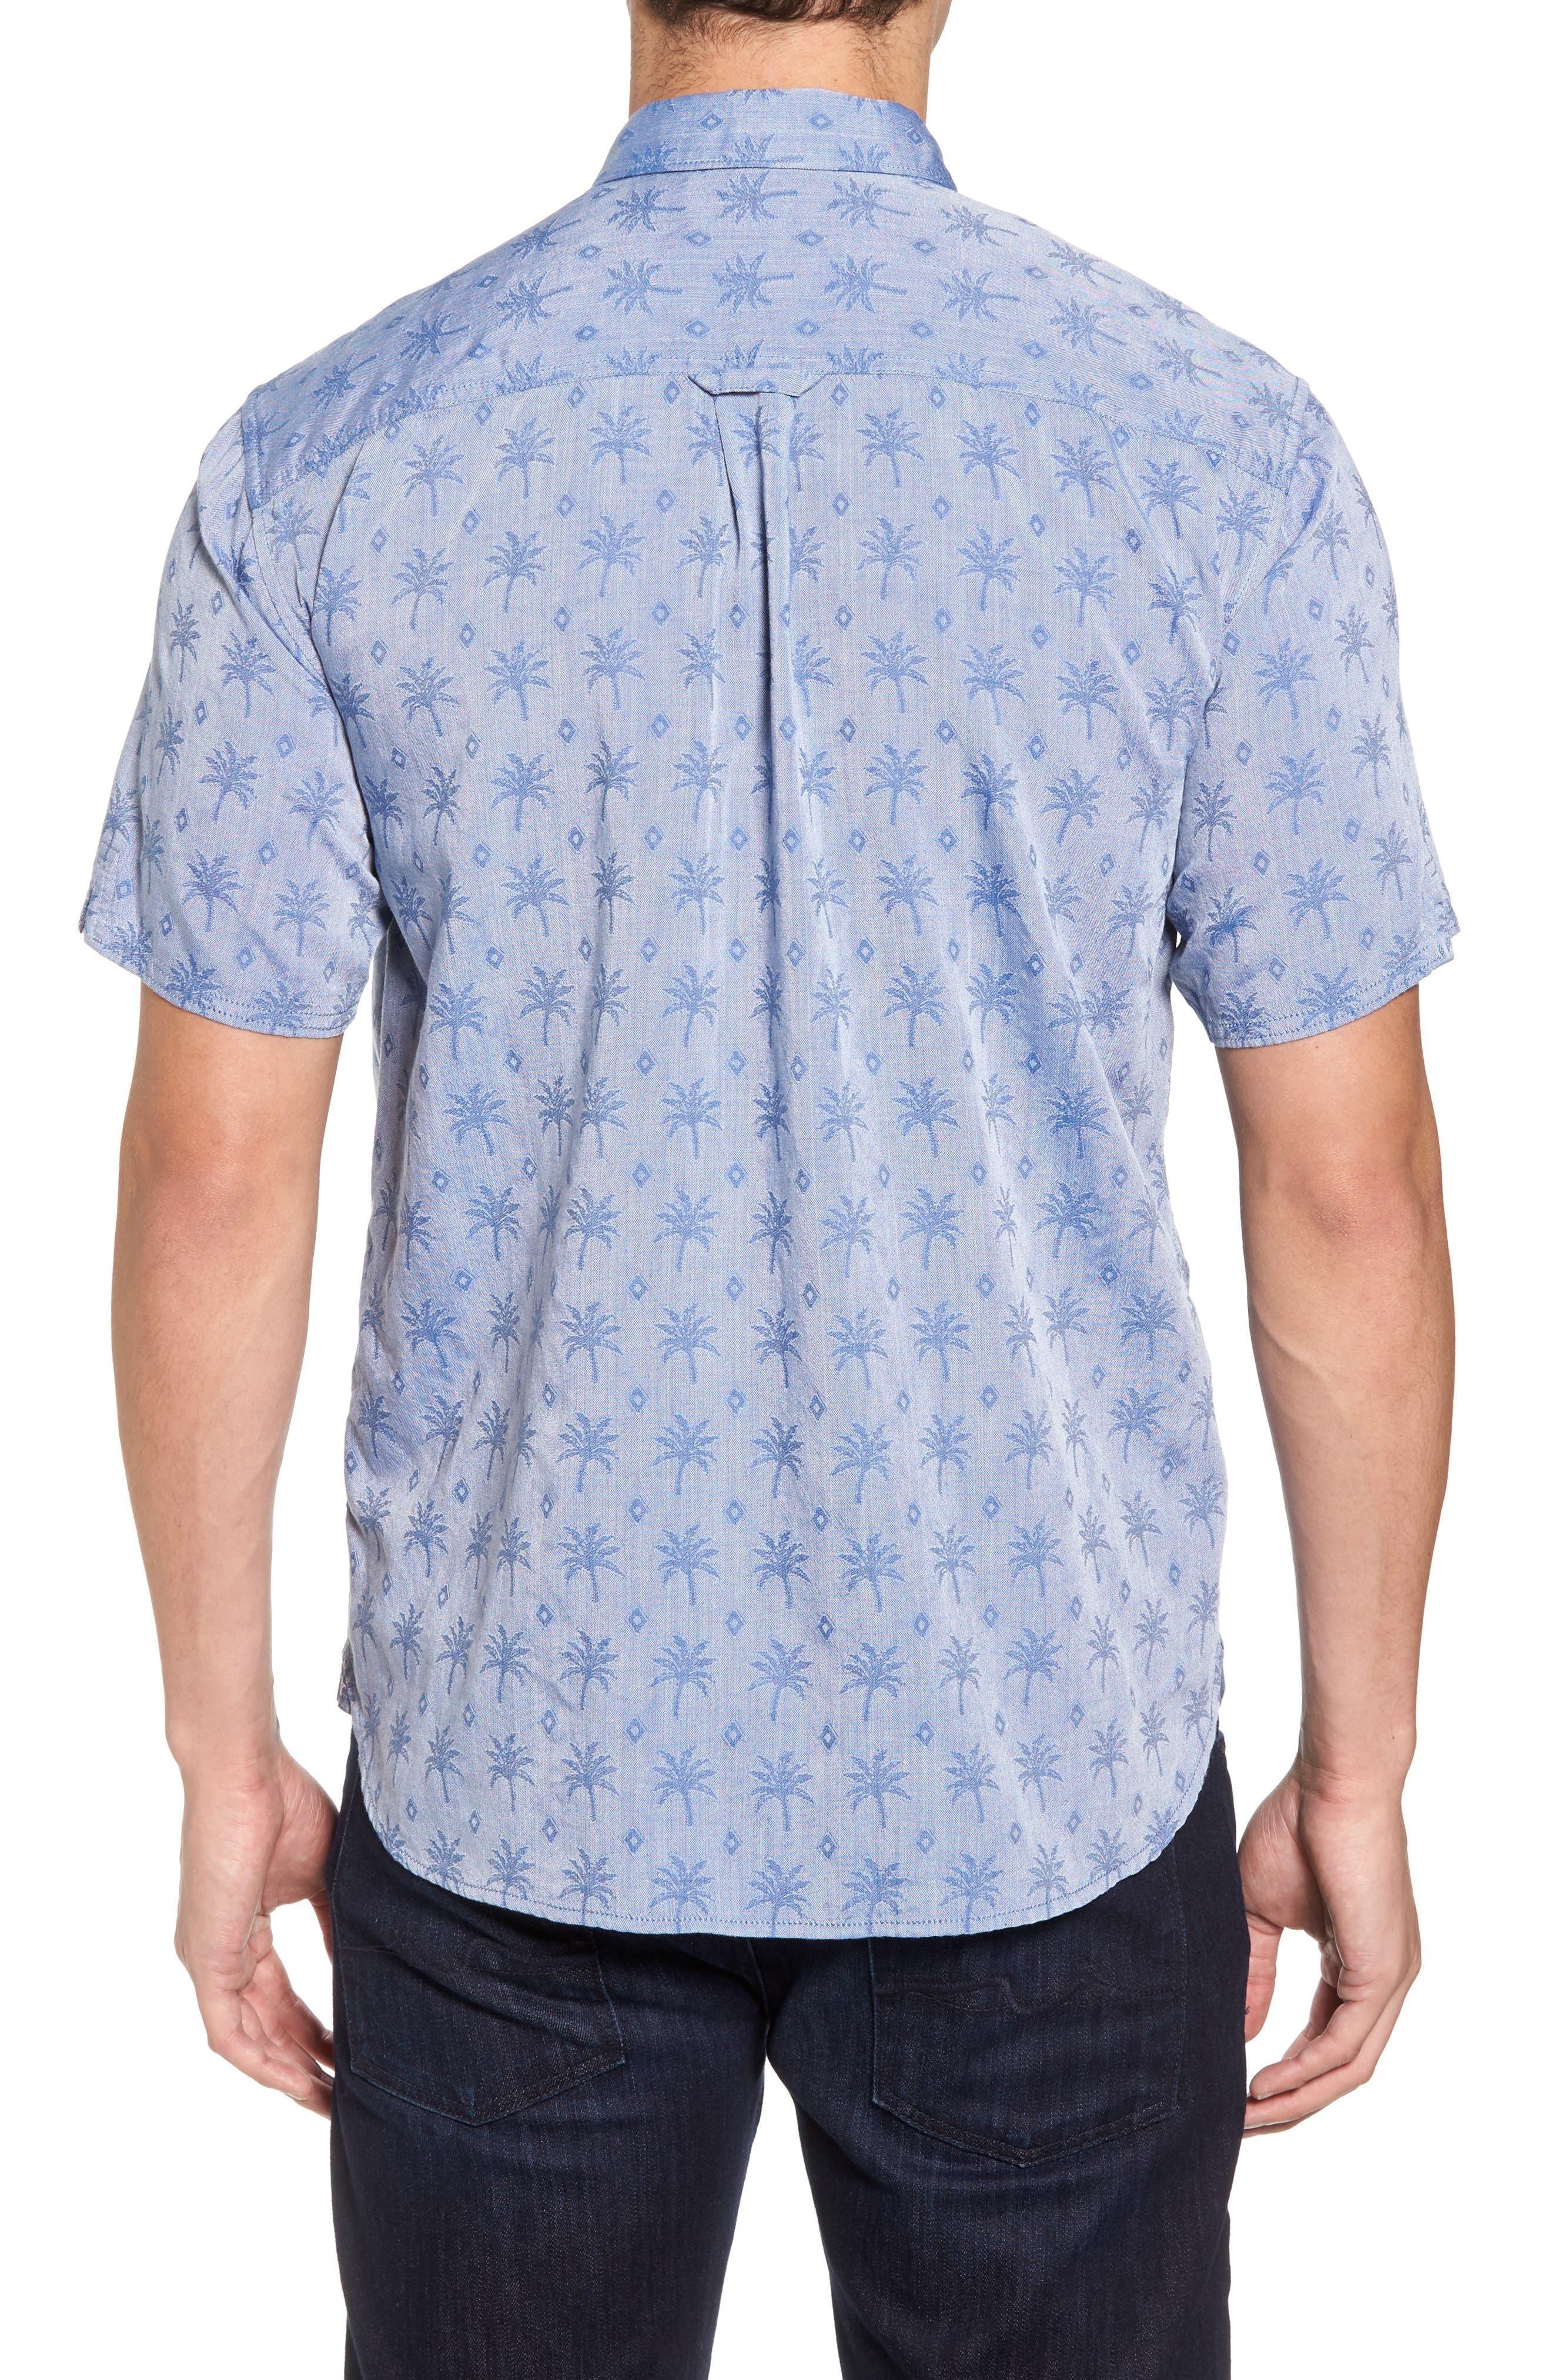 Palm Palm Regular Fit Jacquard Sport Shirt,                             Alternate thumbnail 2, color,                             400